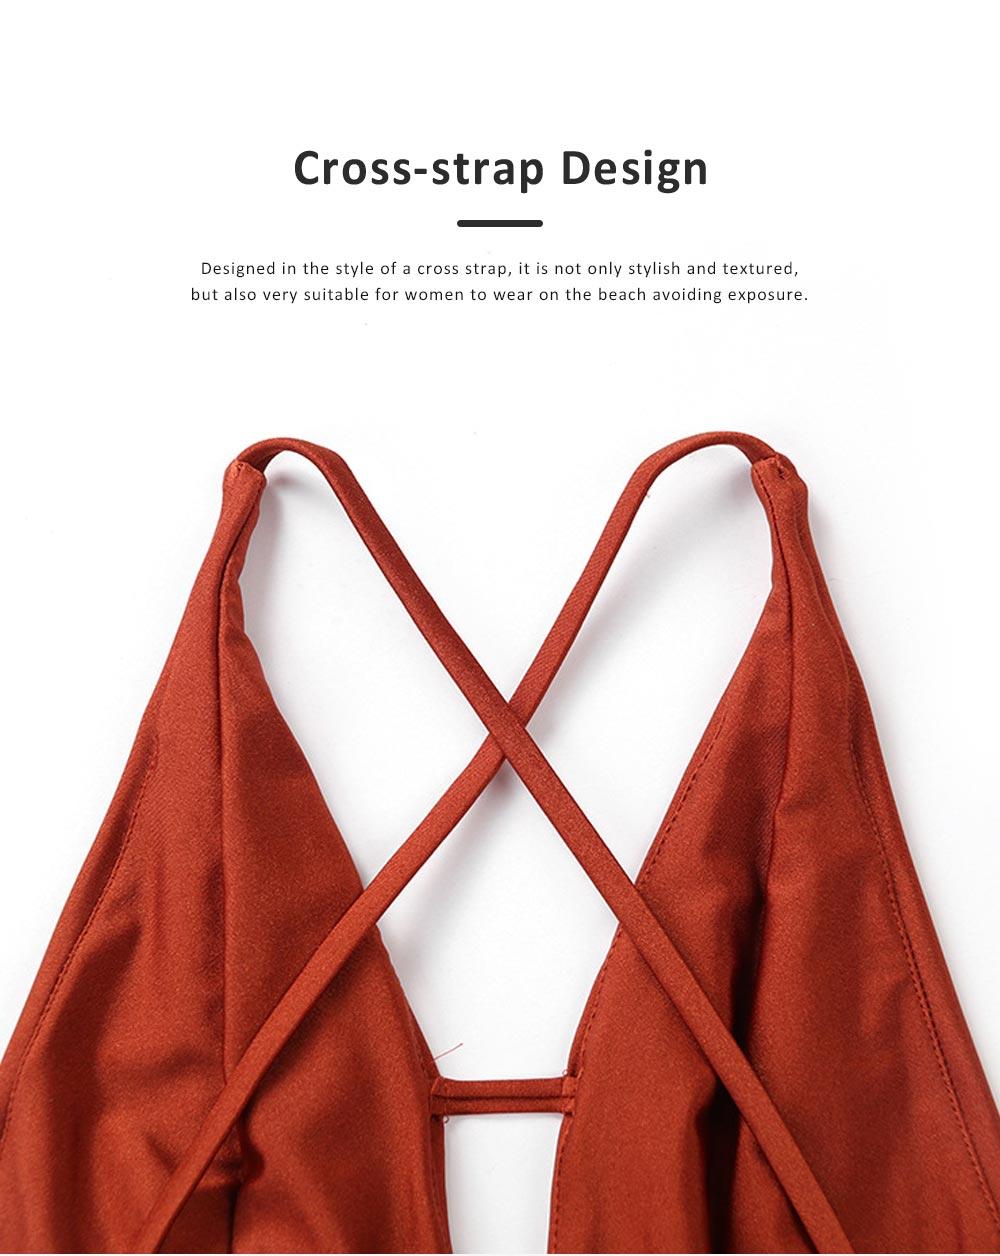 2019 Sexy Cross-strap Backless Bikini for Women , One-piece High Waist Swimwear Adjustable Shoulder Strap Backless Swimming Suit Bikini Red 1